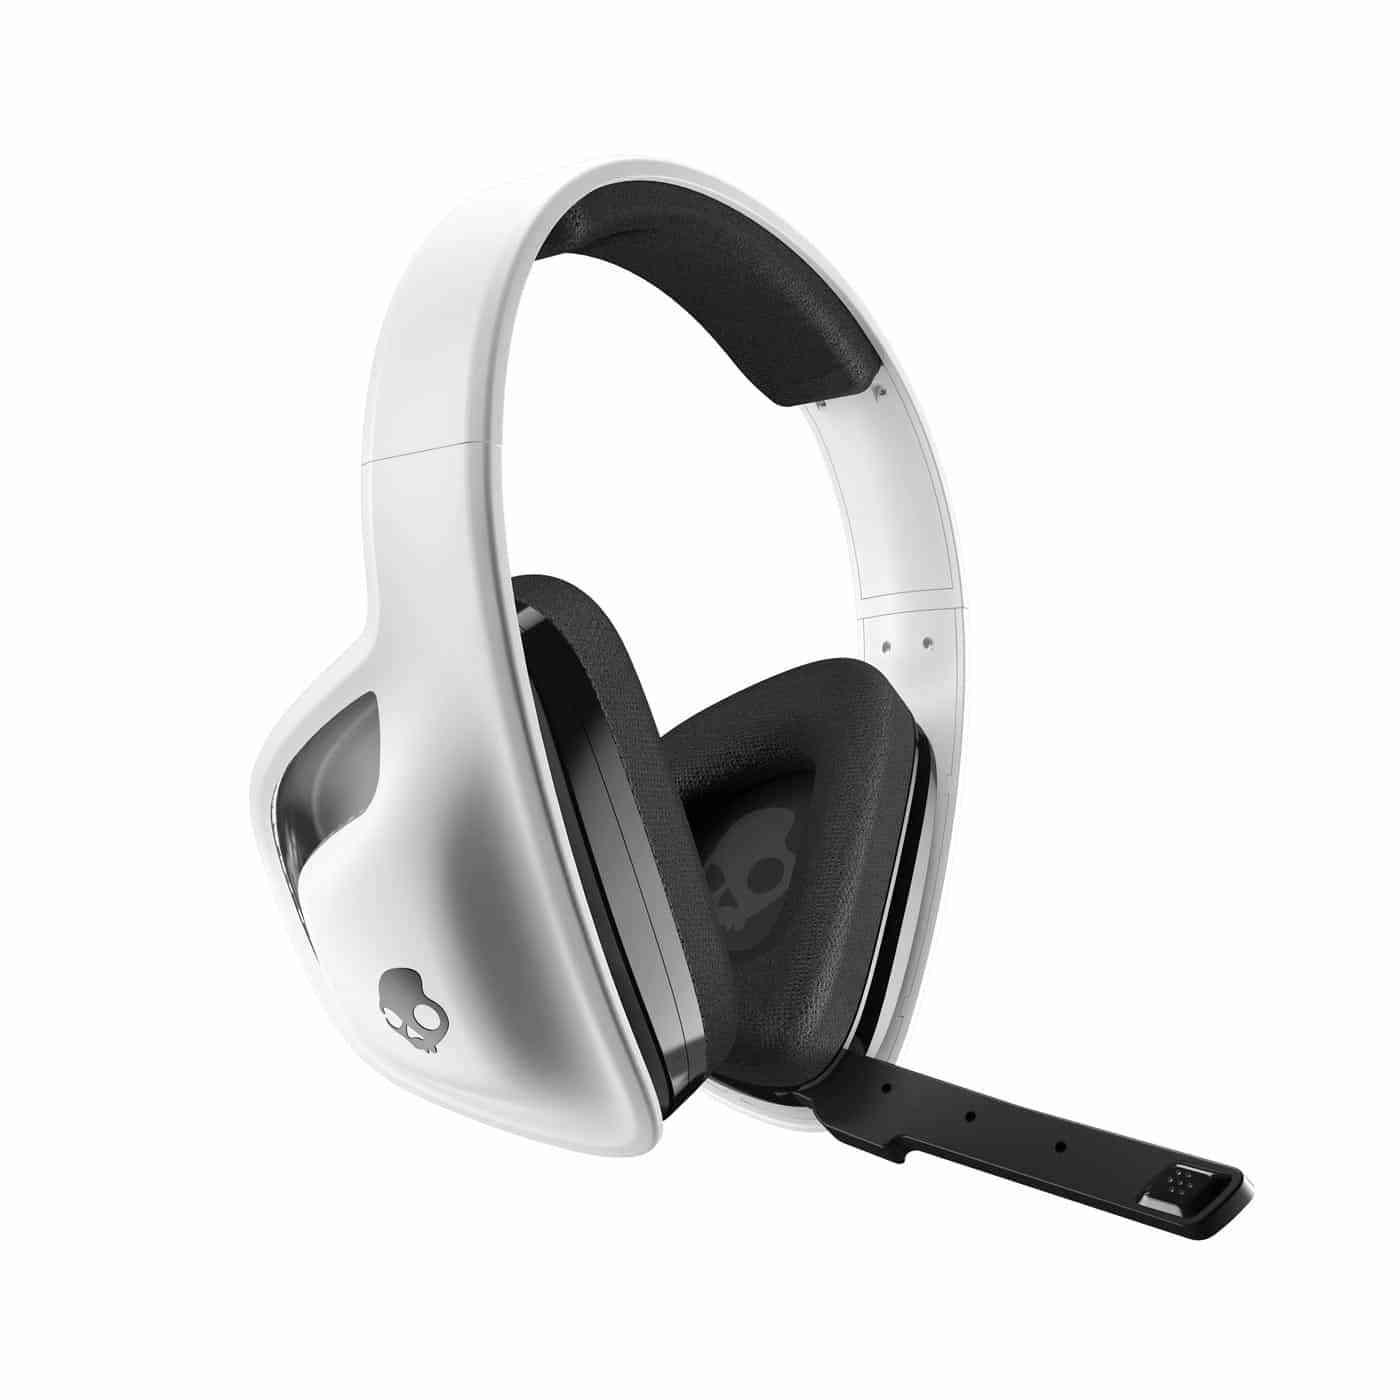 Canadian Online Gamers 187 Skullcandy Slyr Gaming Headset Review